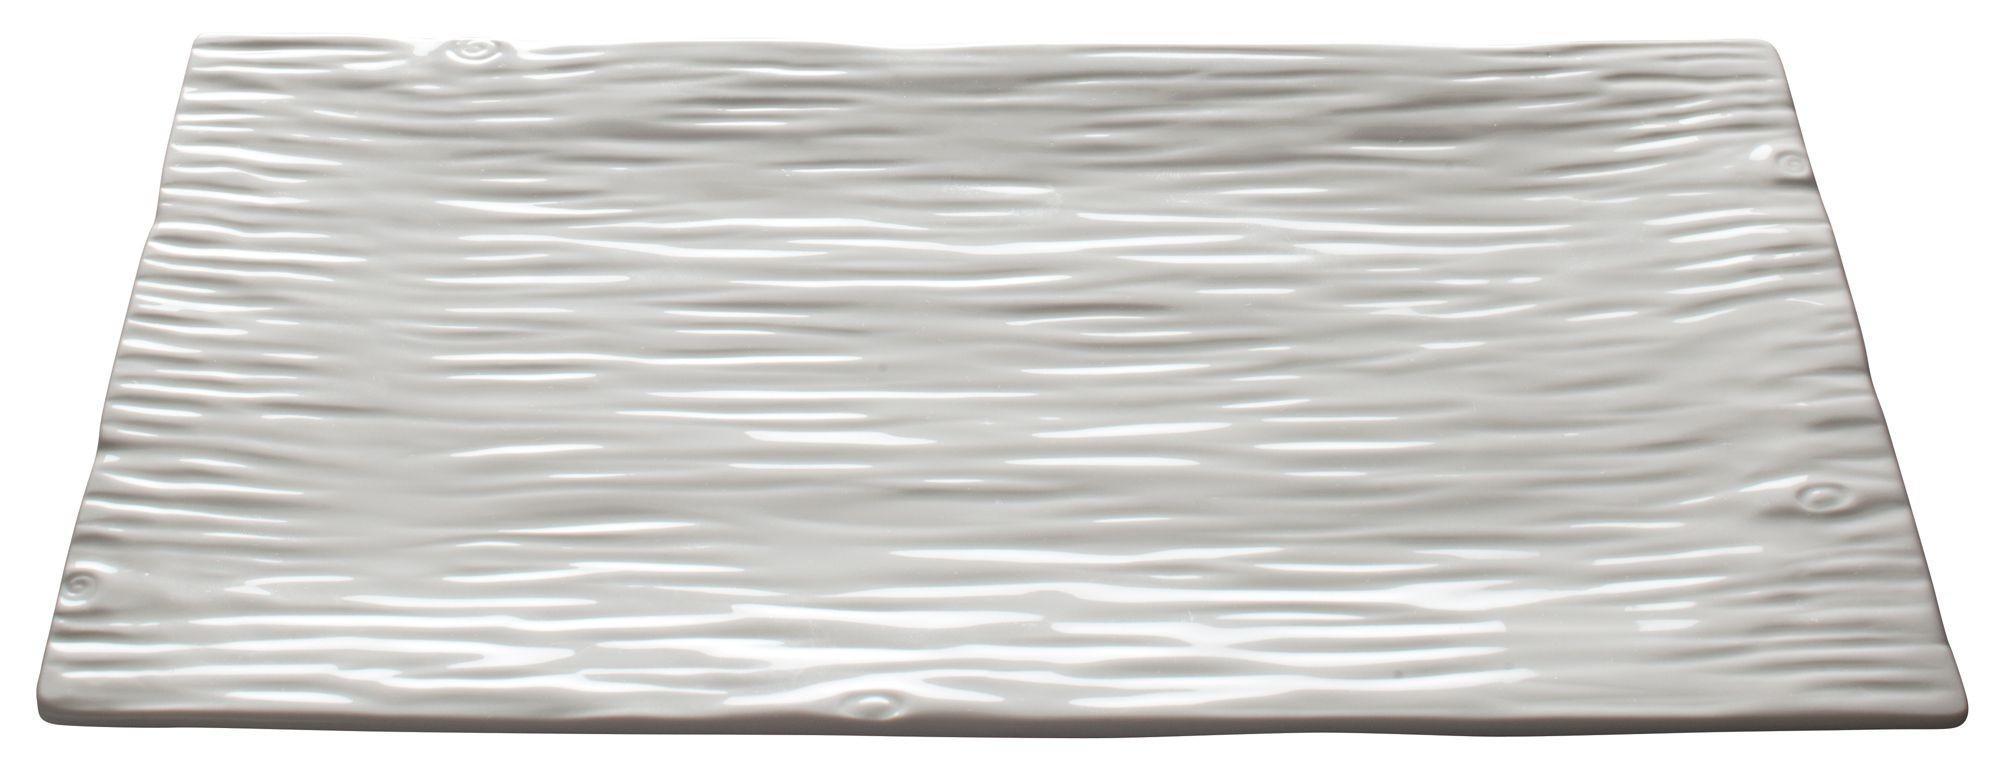 "Winco WDP002-204 Dalmata Creamy White Porcelain Rectangular Platter 18-1/8"" x 10-5/8"""